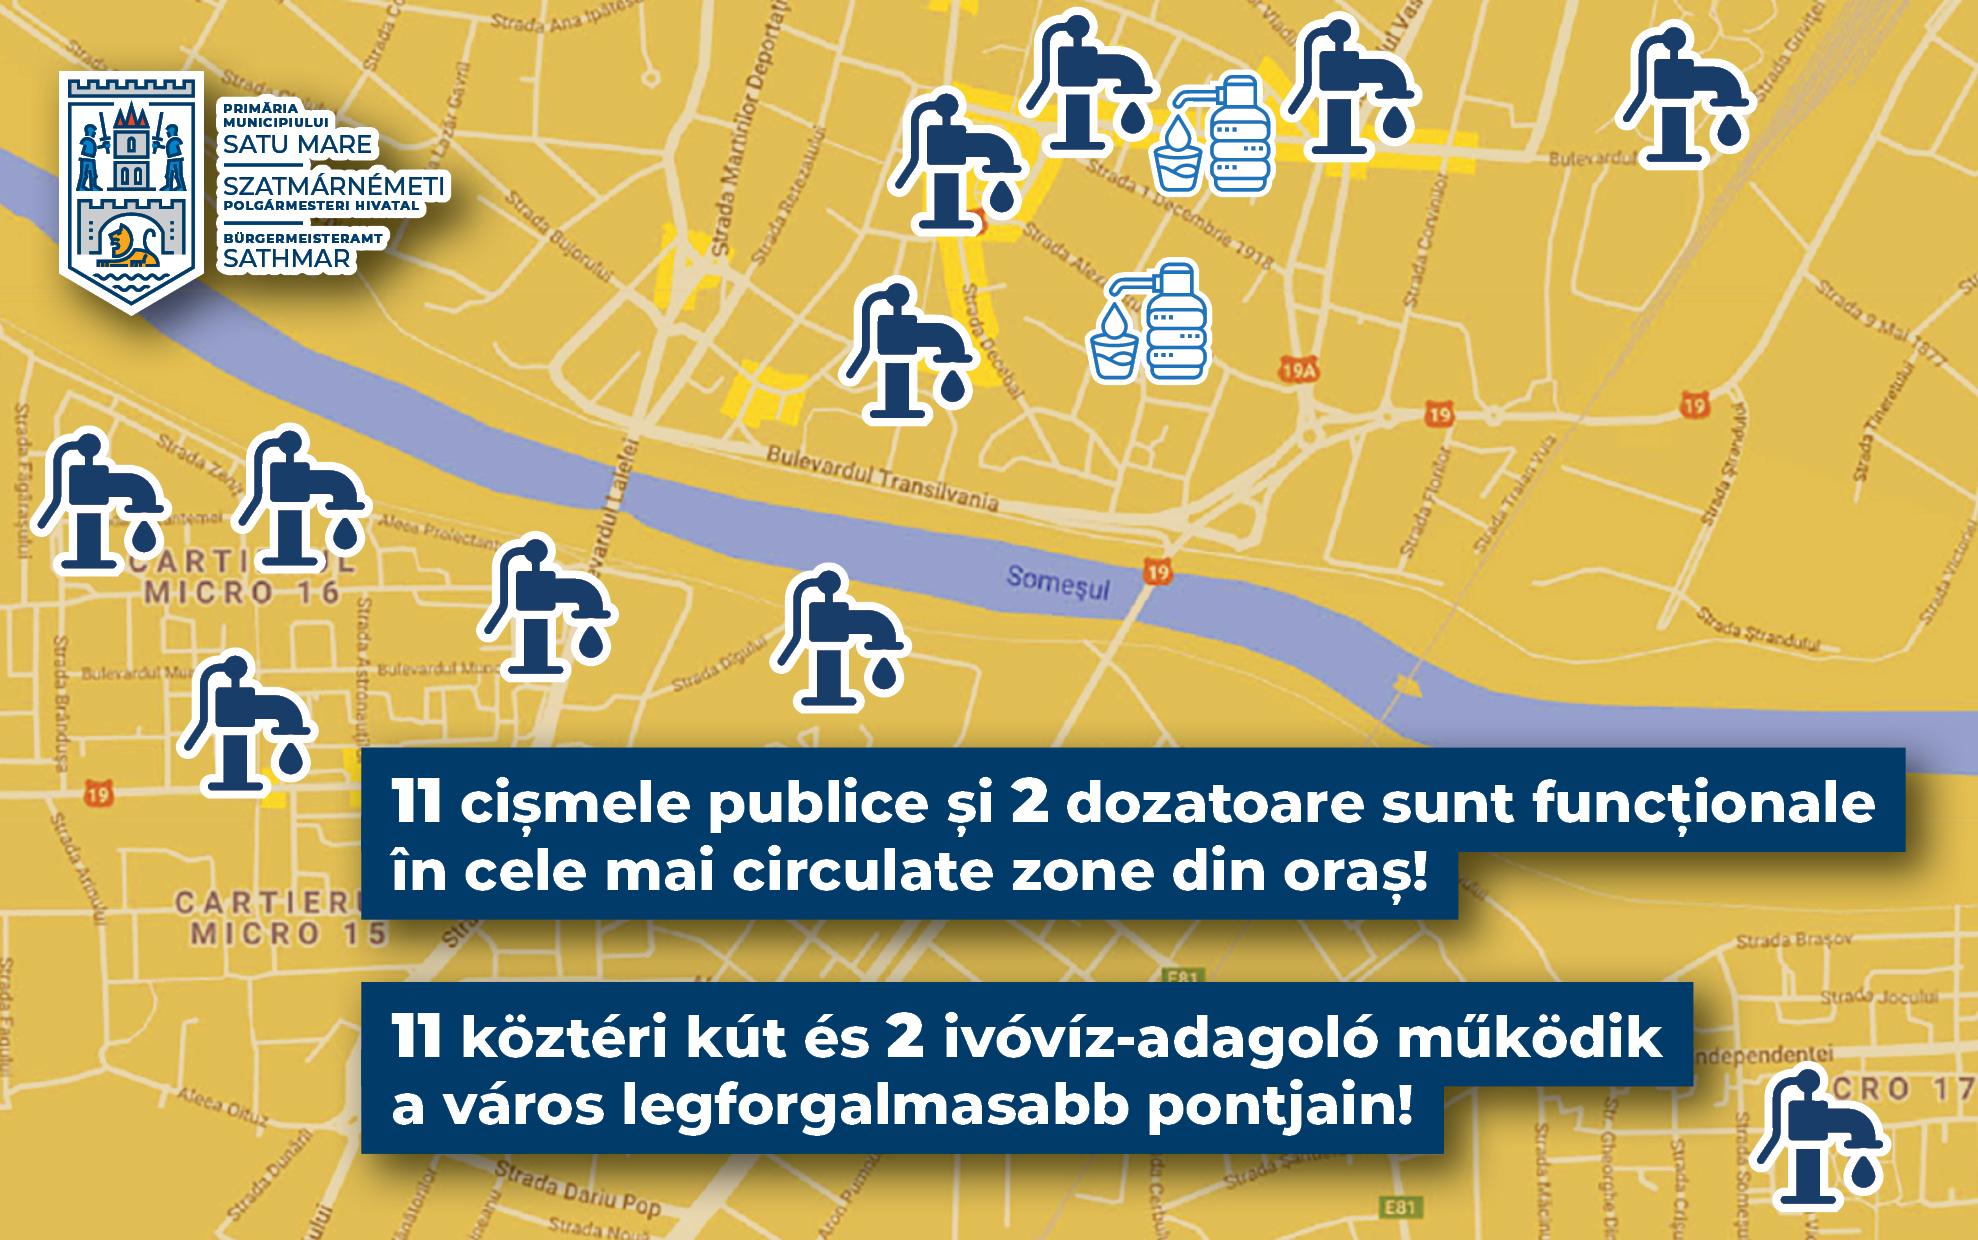 Locuri unde va puteti racori ! Harta cismelelor din Satu Mare ! (Foto)